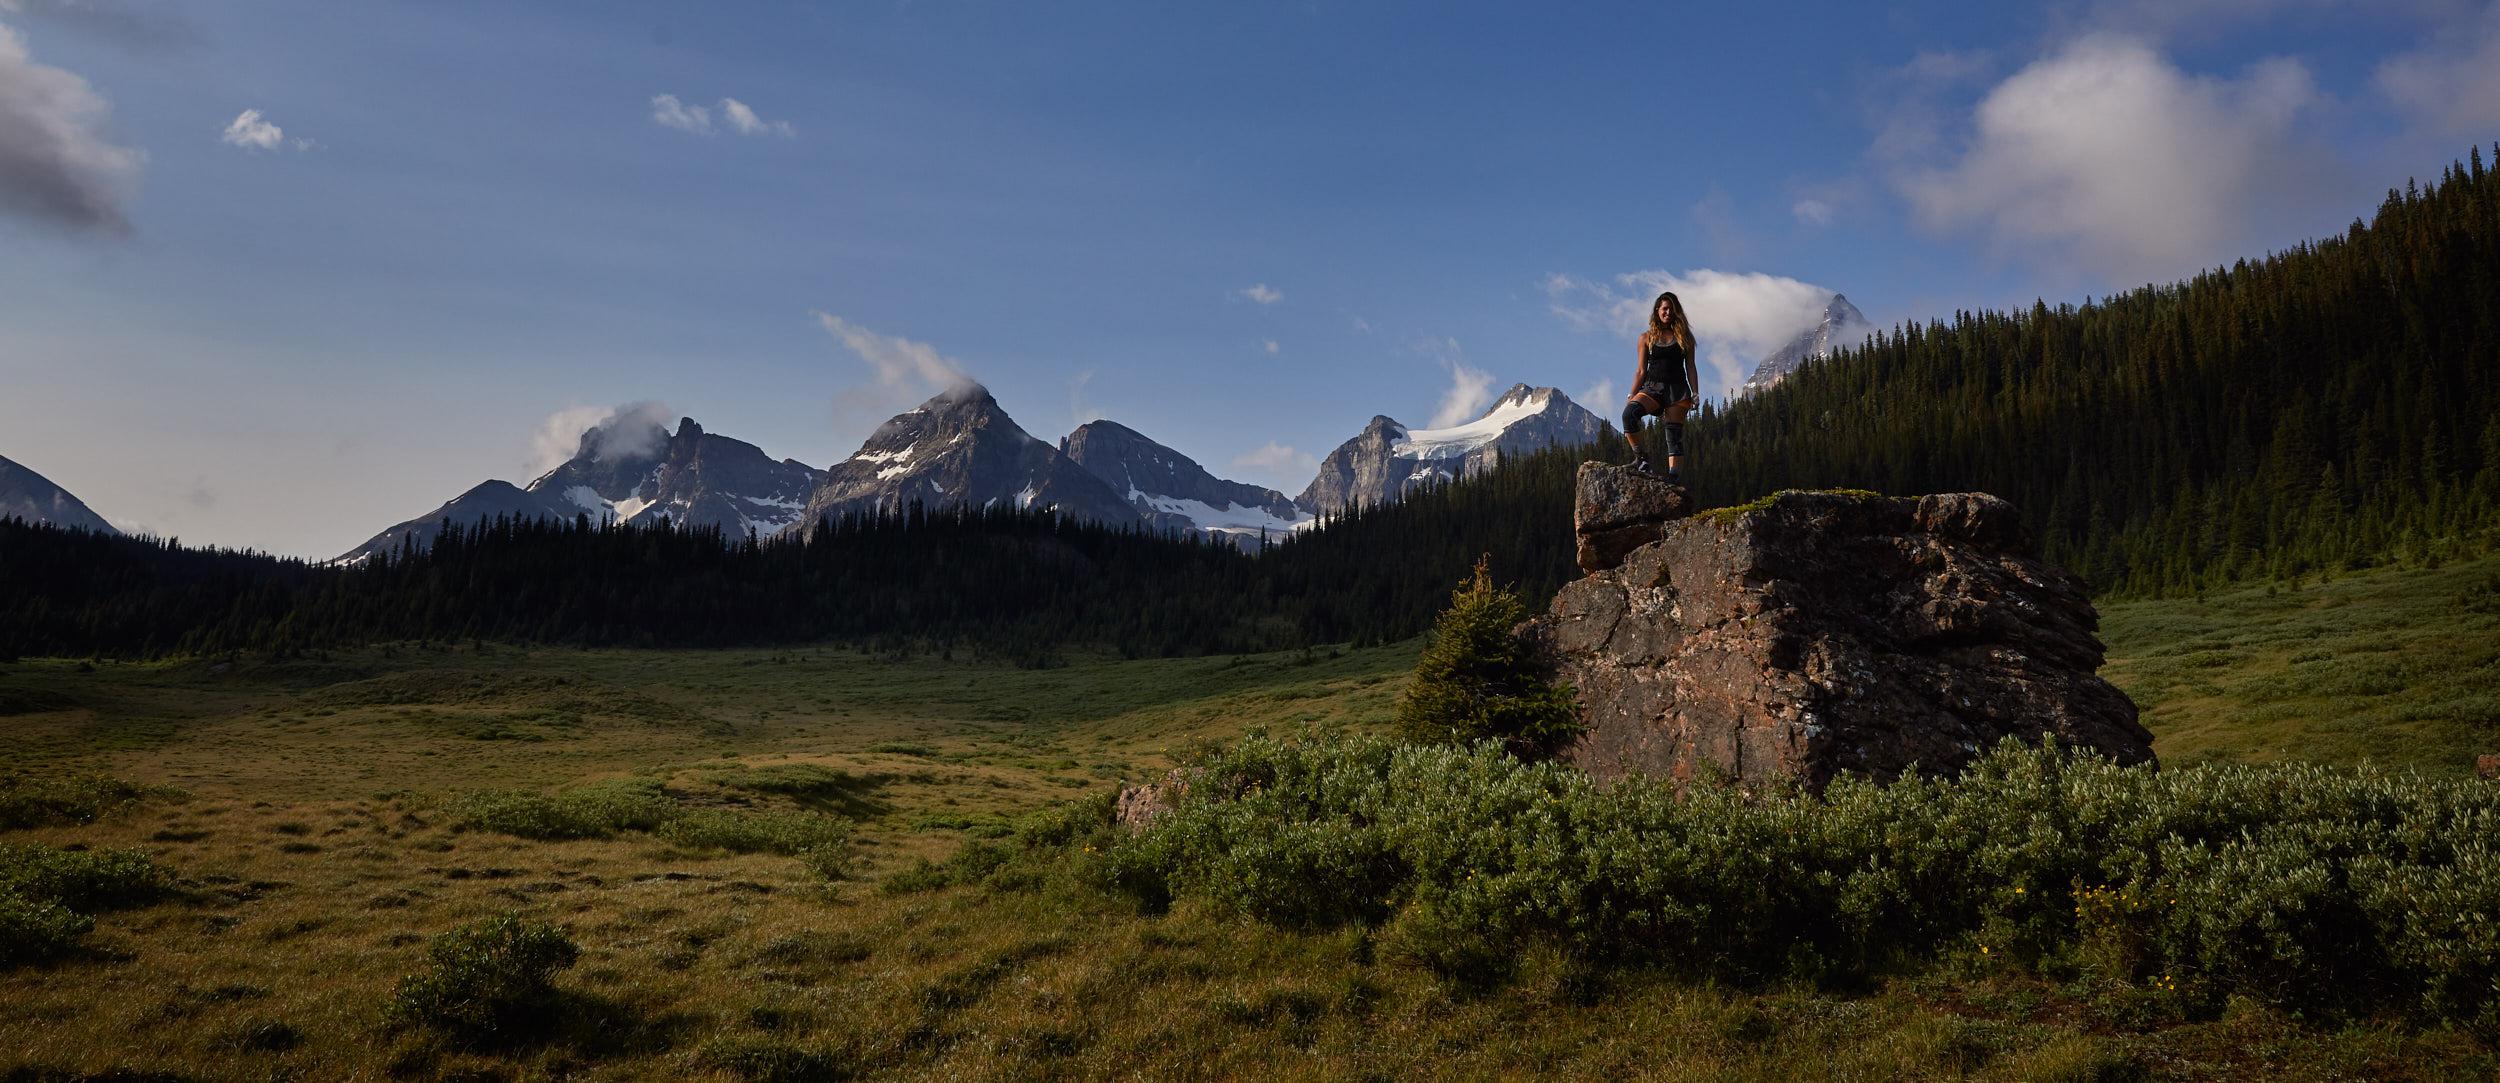 Mount Assiniboine 22.jpg